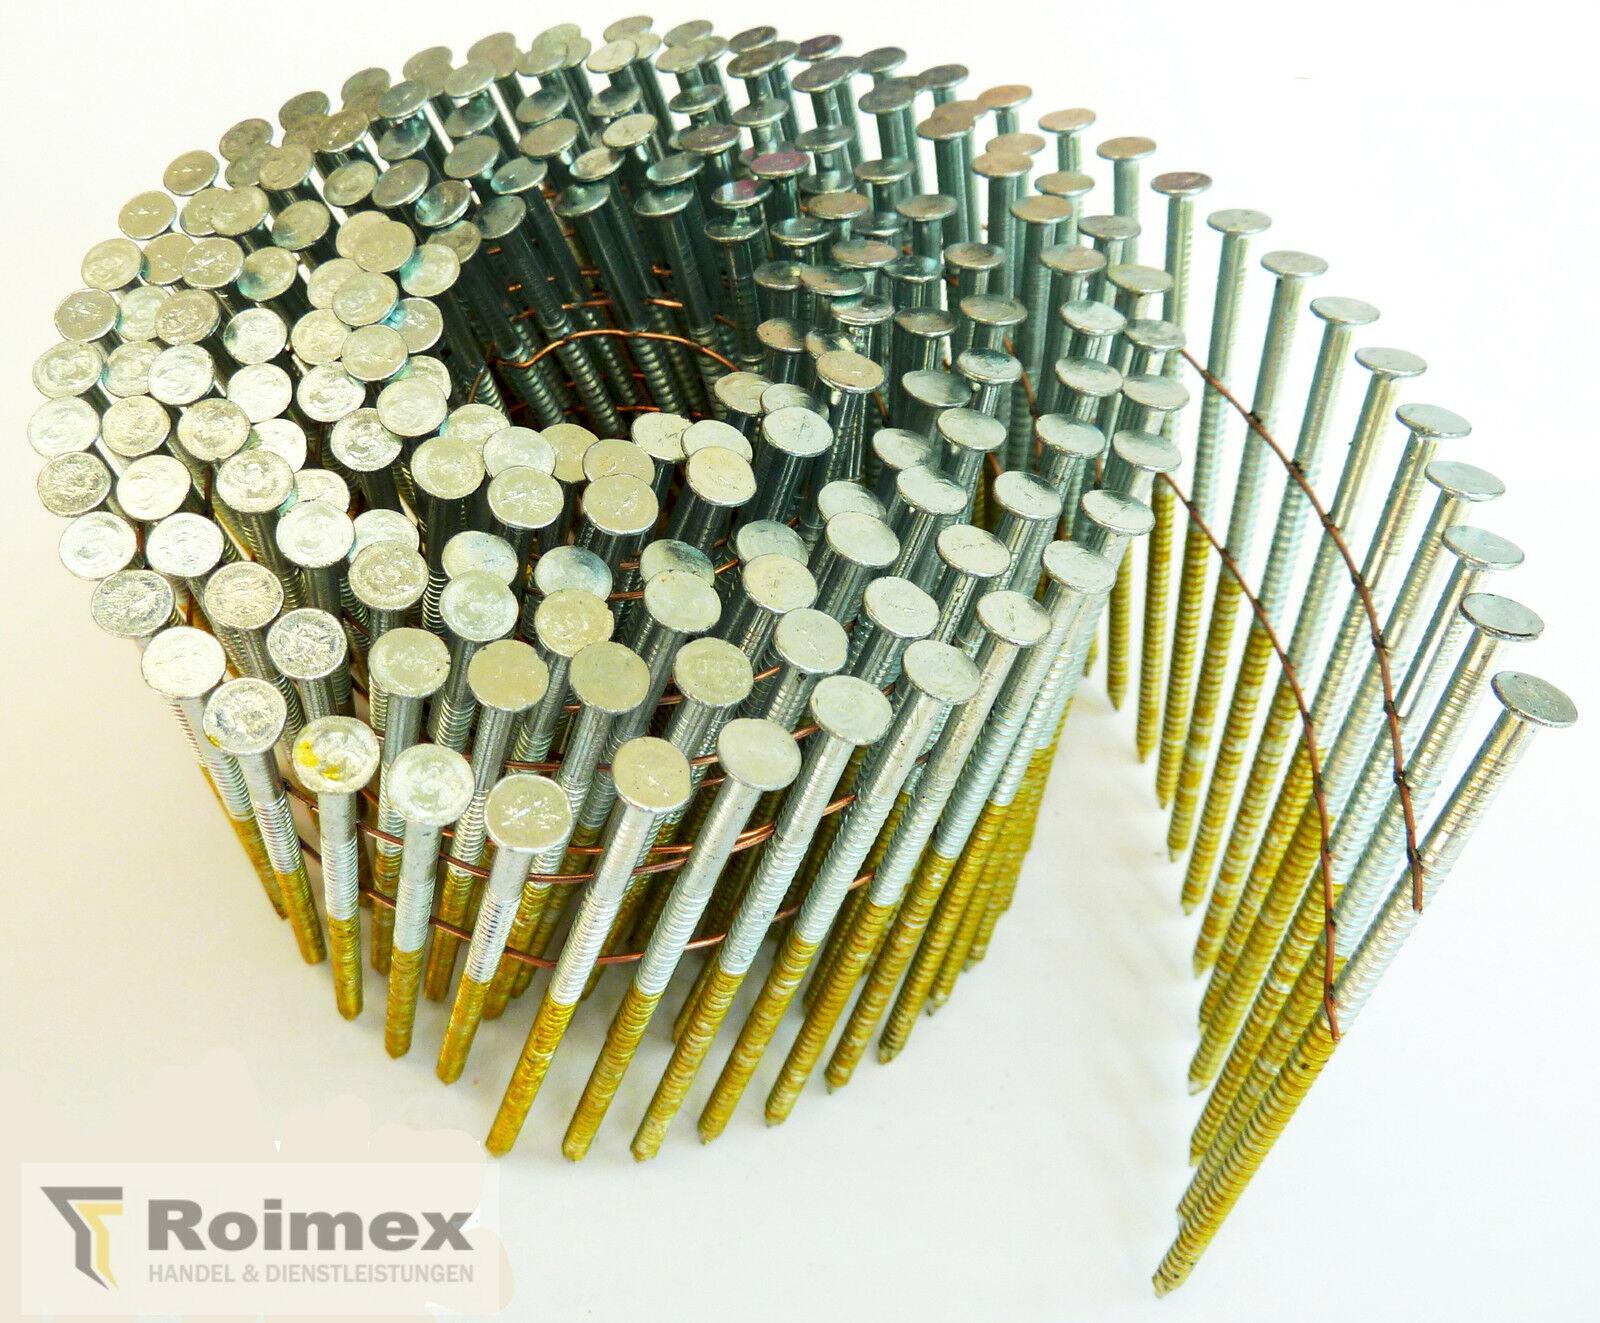 6000 Coilnägel 16° drahtgeb. 2,8x65mm feuerverzinkt 50my HDG RING zertifiziert